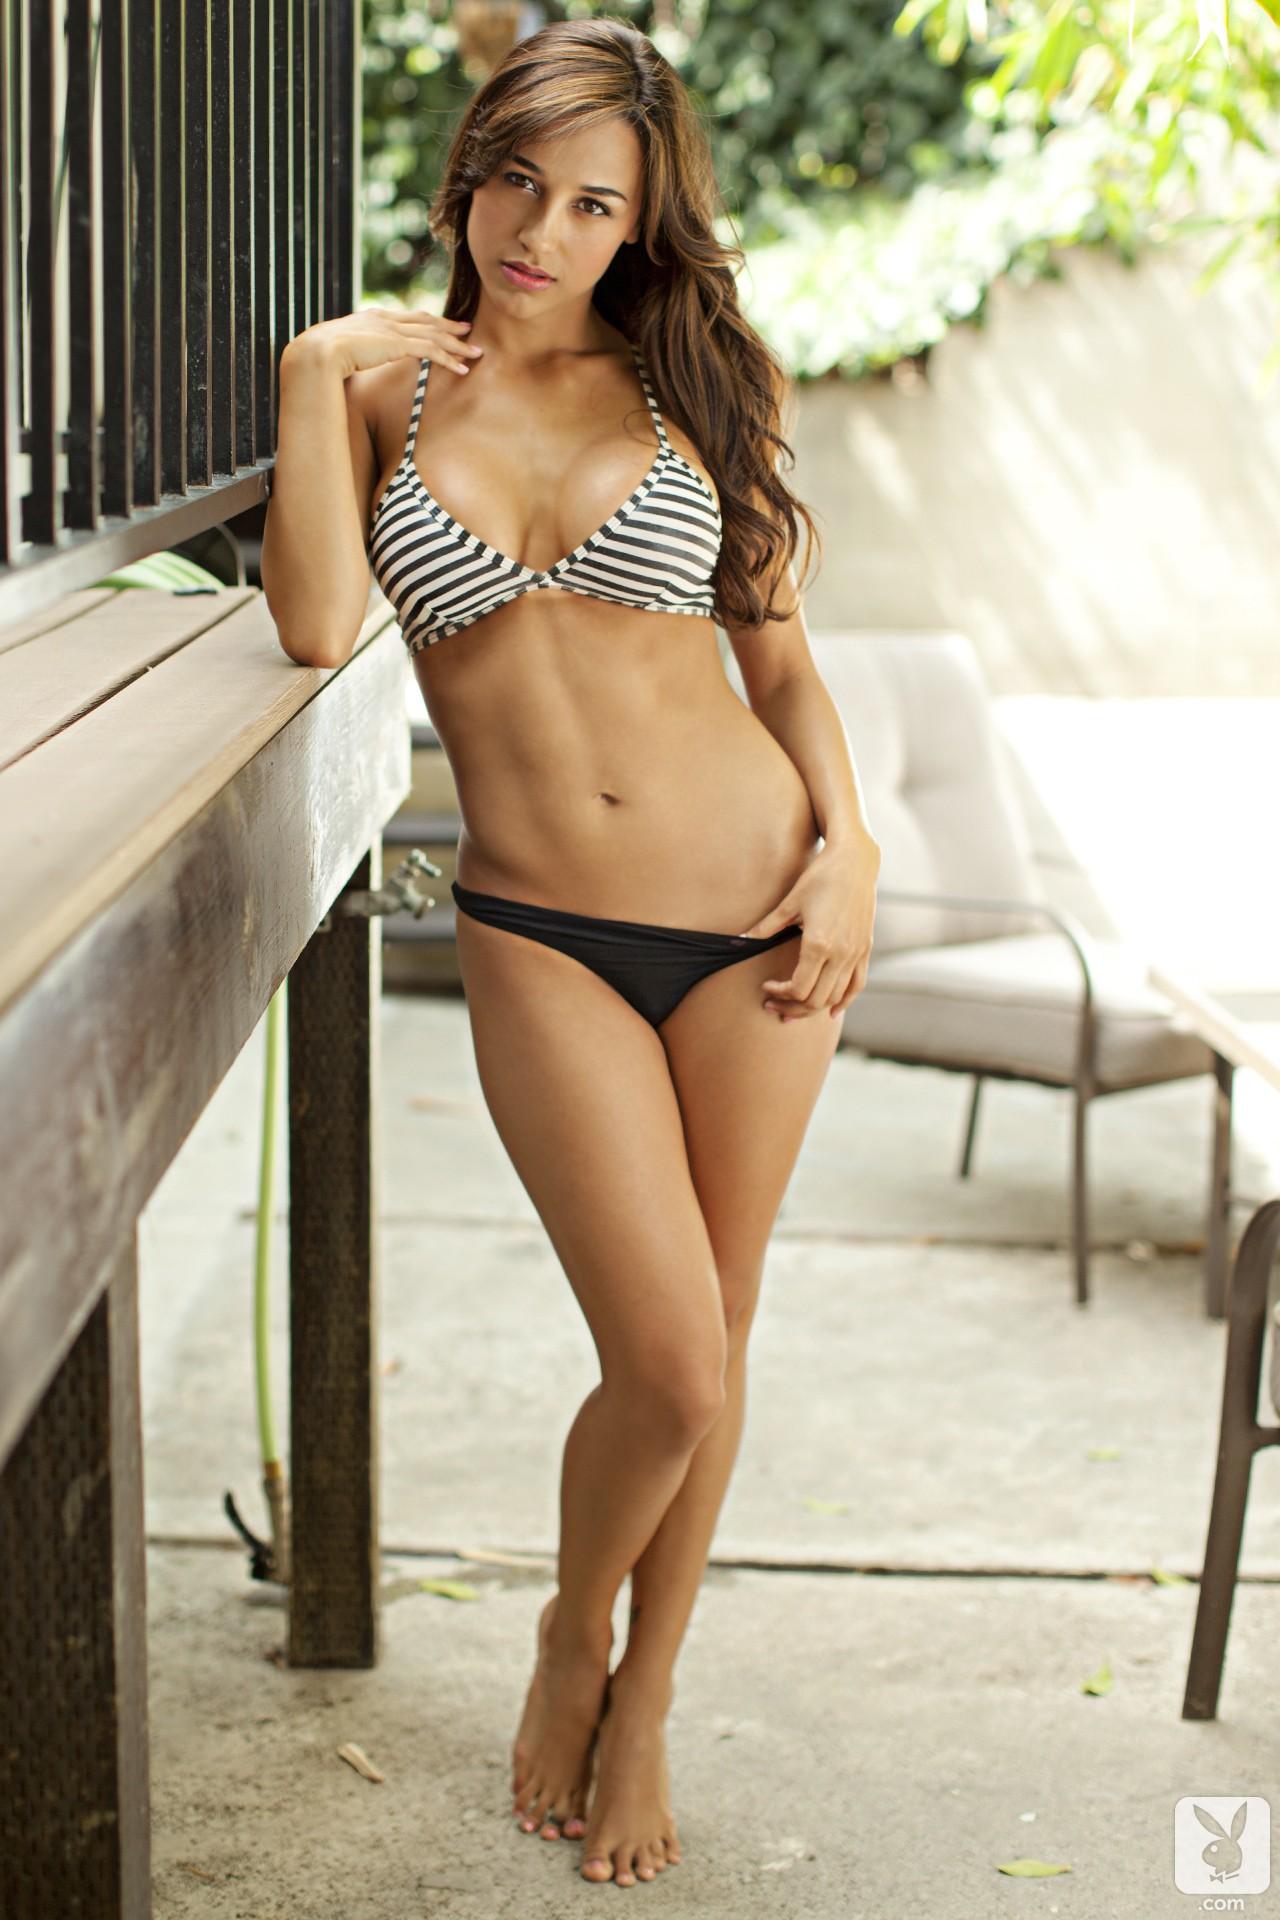 Ana Cheri Playboy wallpaper : ana cheri, women, model, brunette, bikini, big